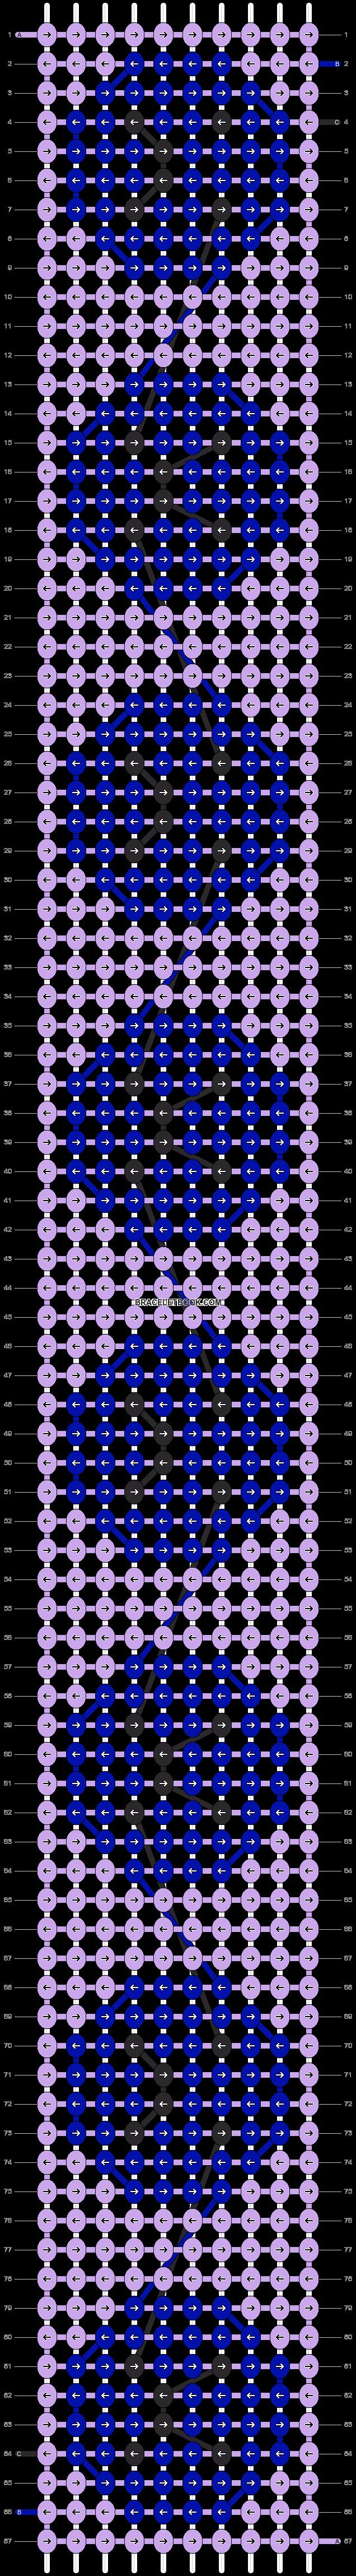 Alpha pattern #86854 variation #157026 pattern